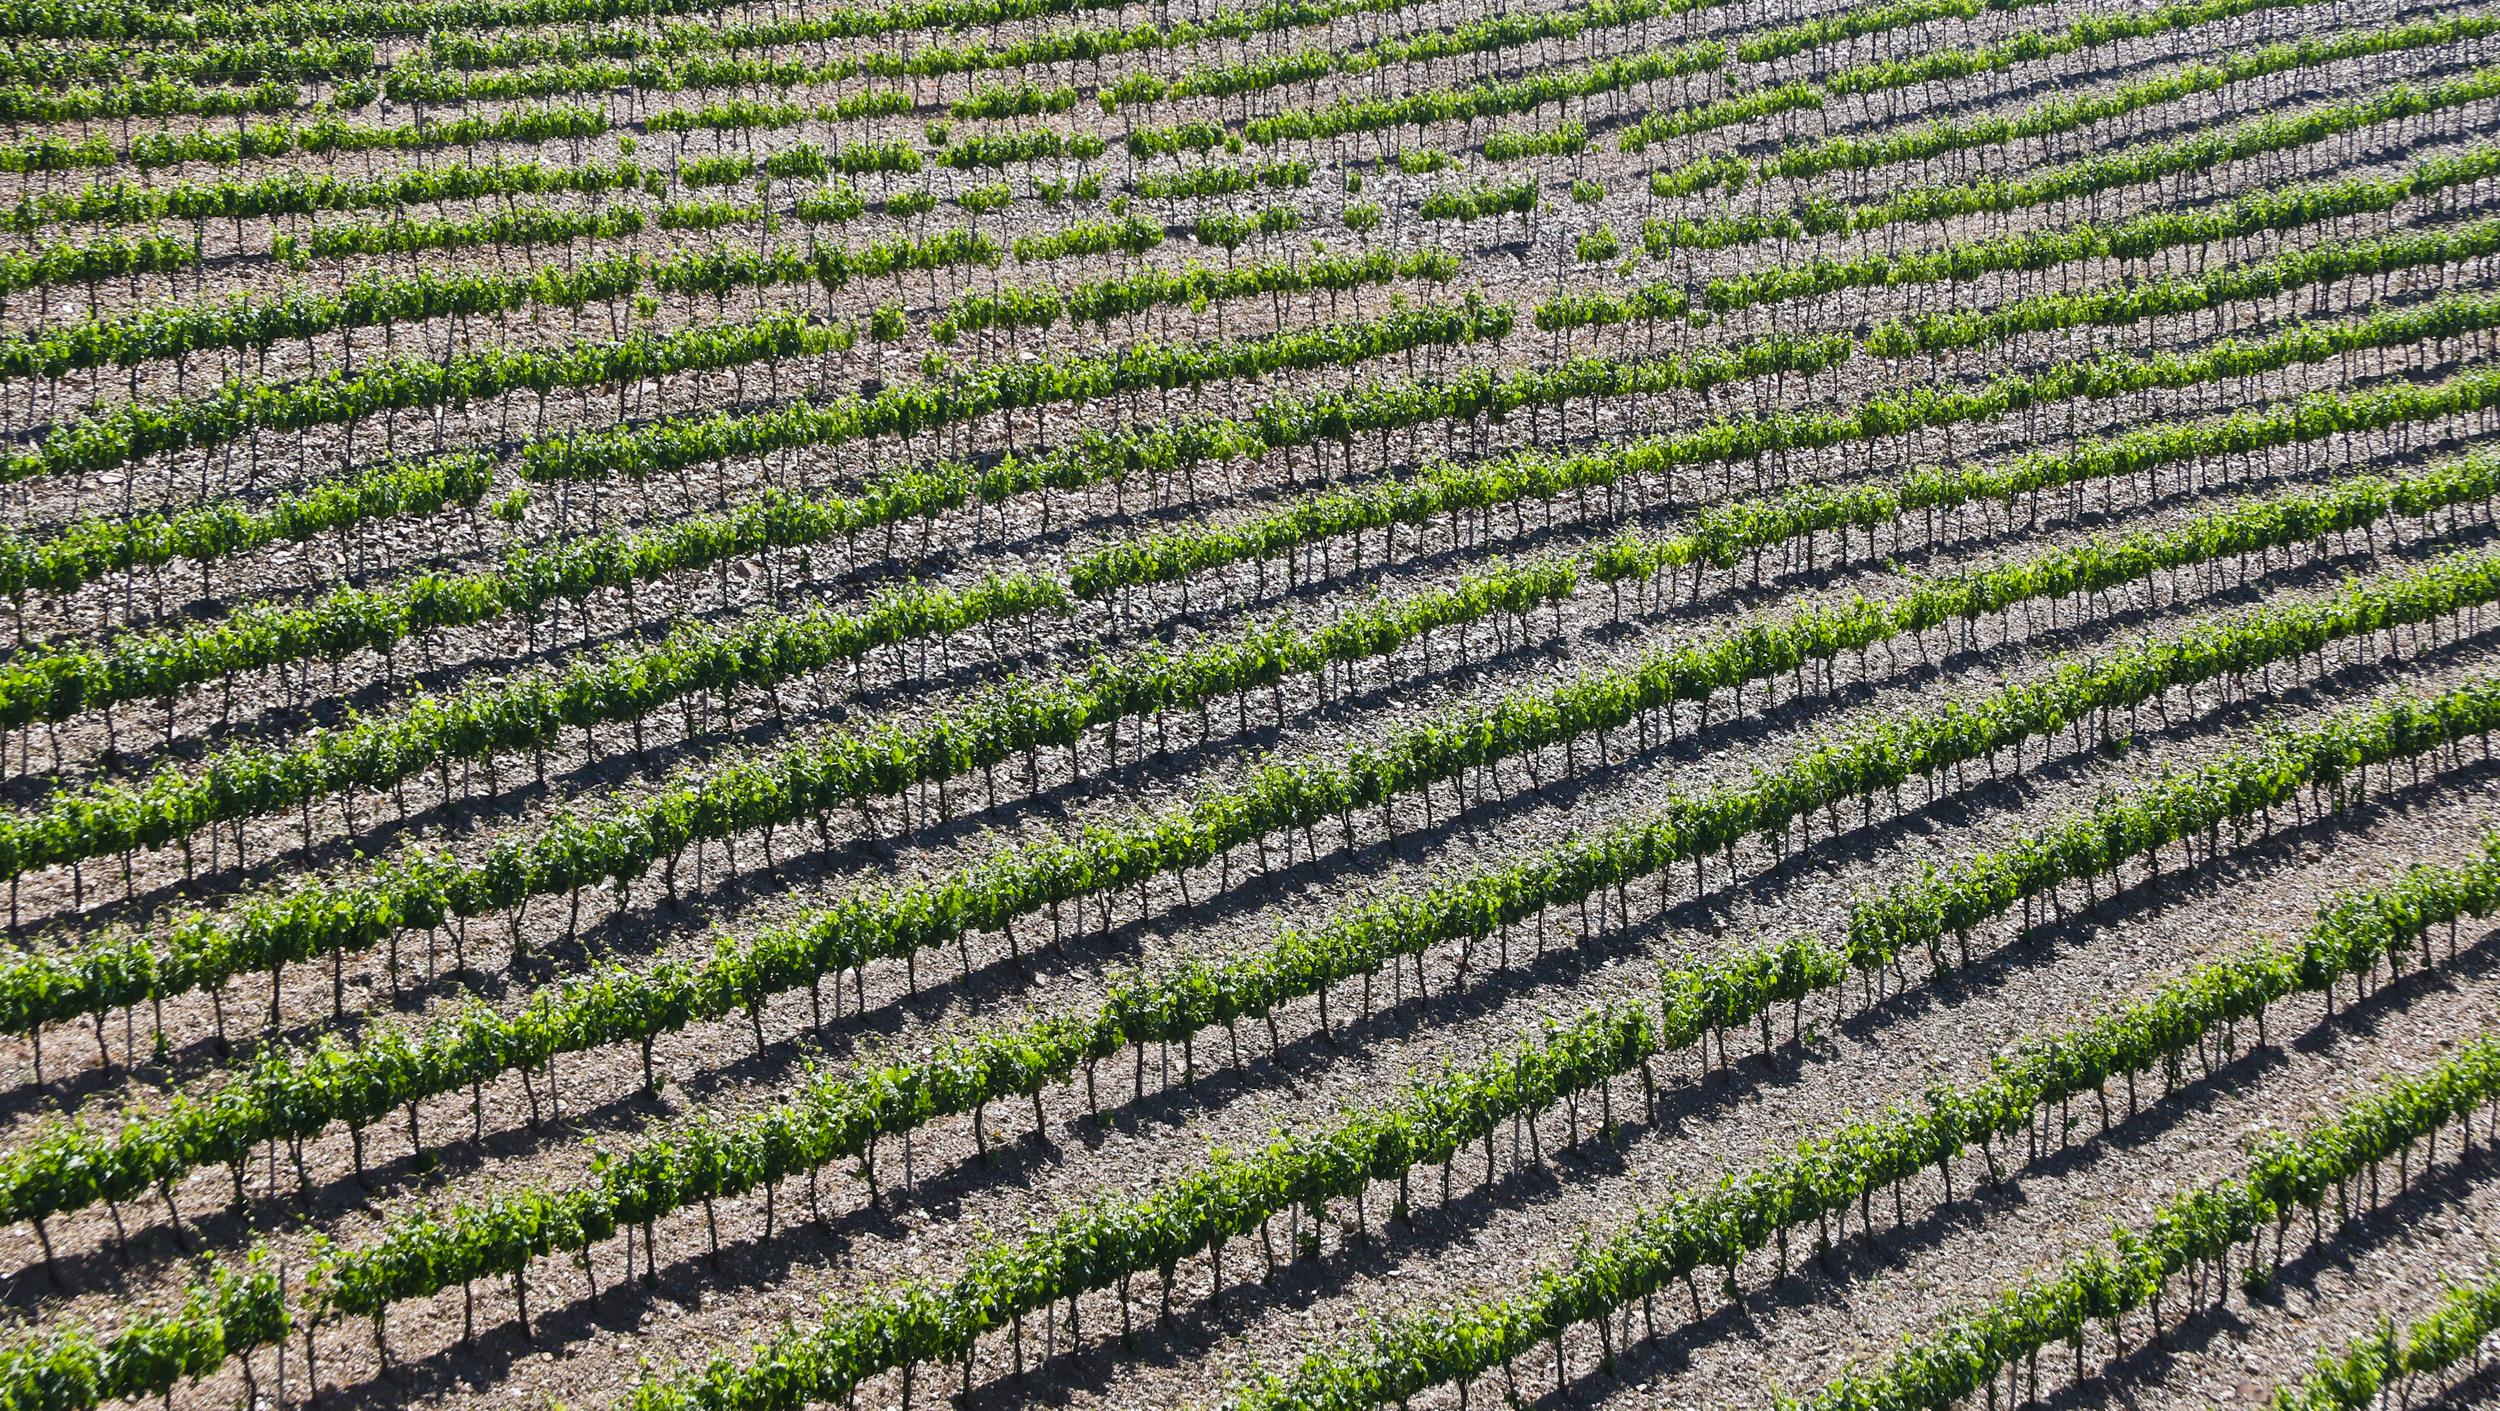 Vineyards of Granada